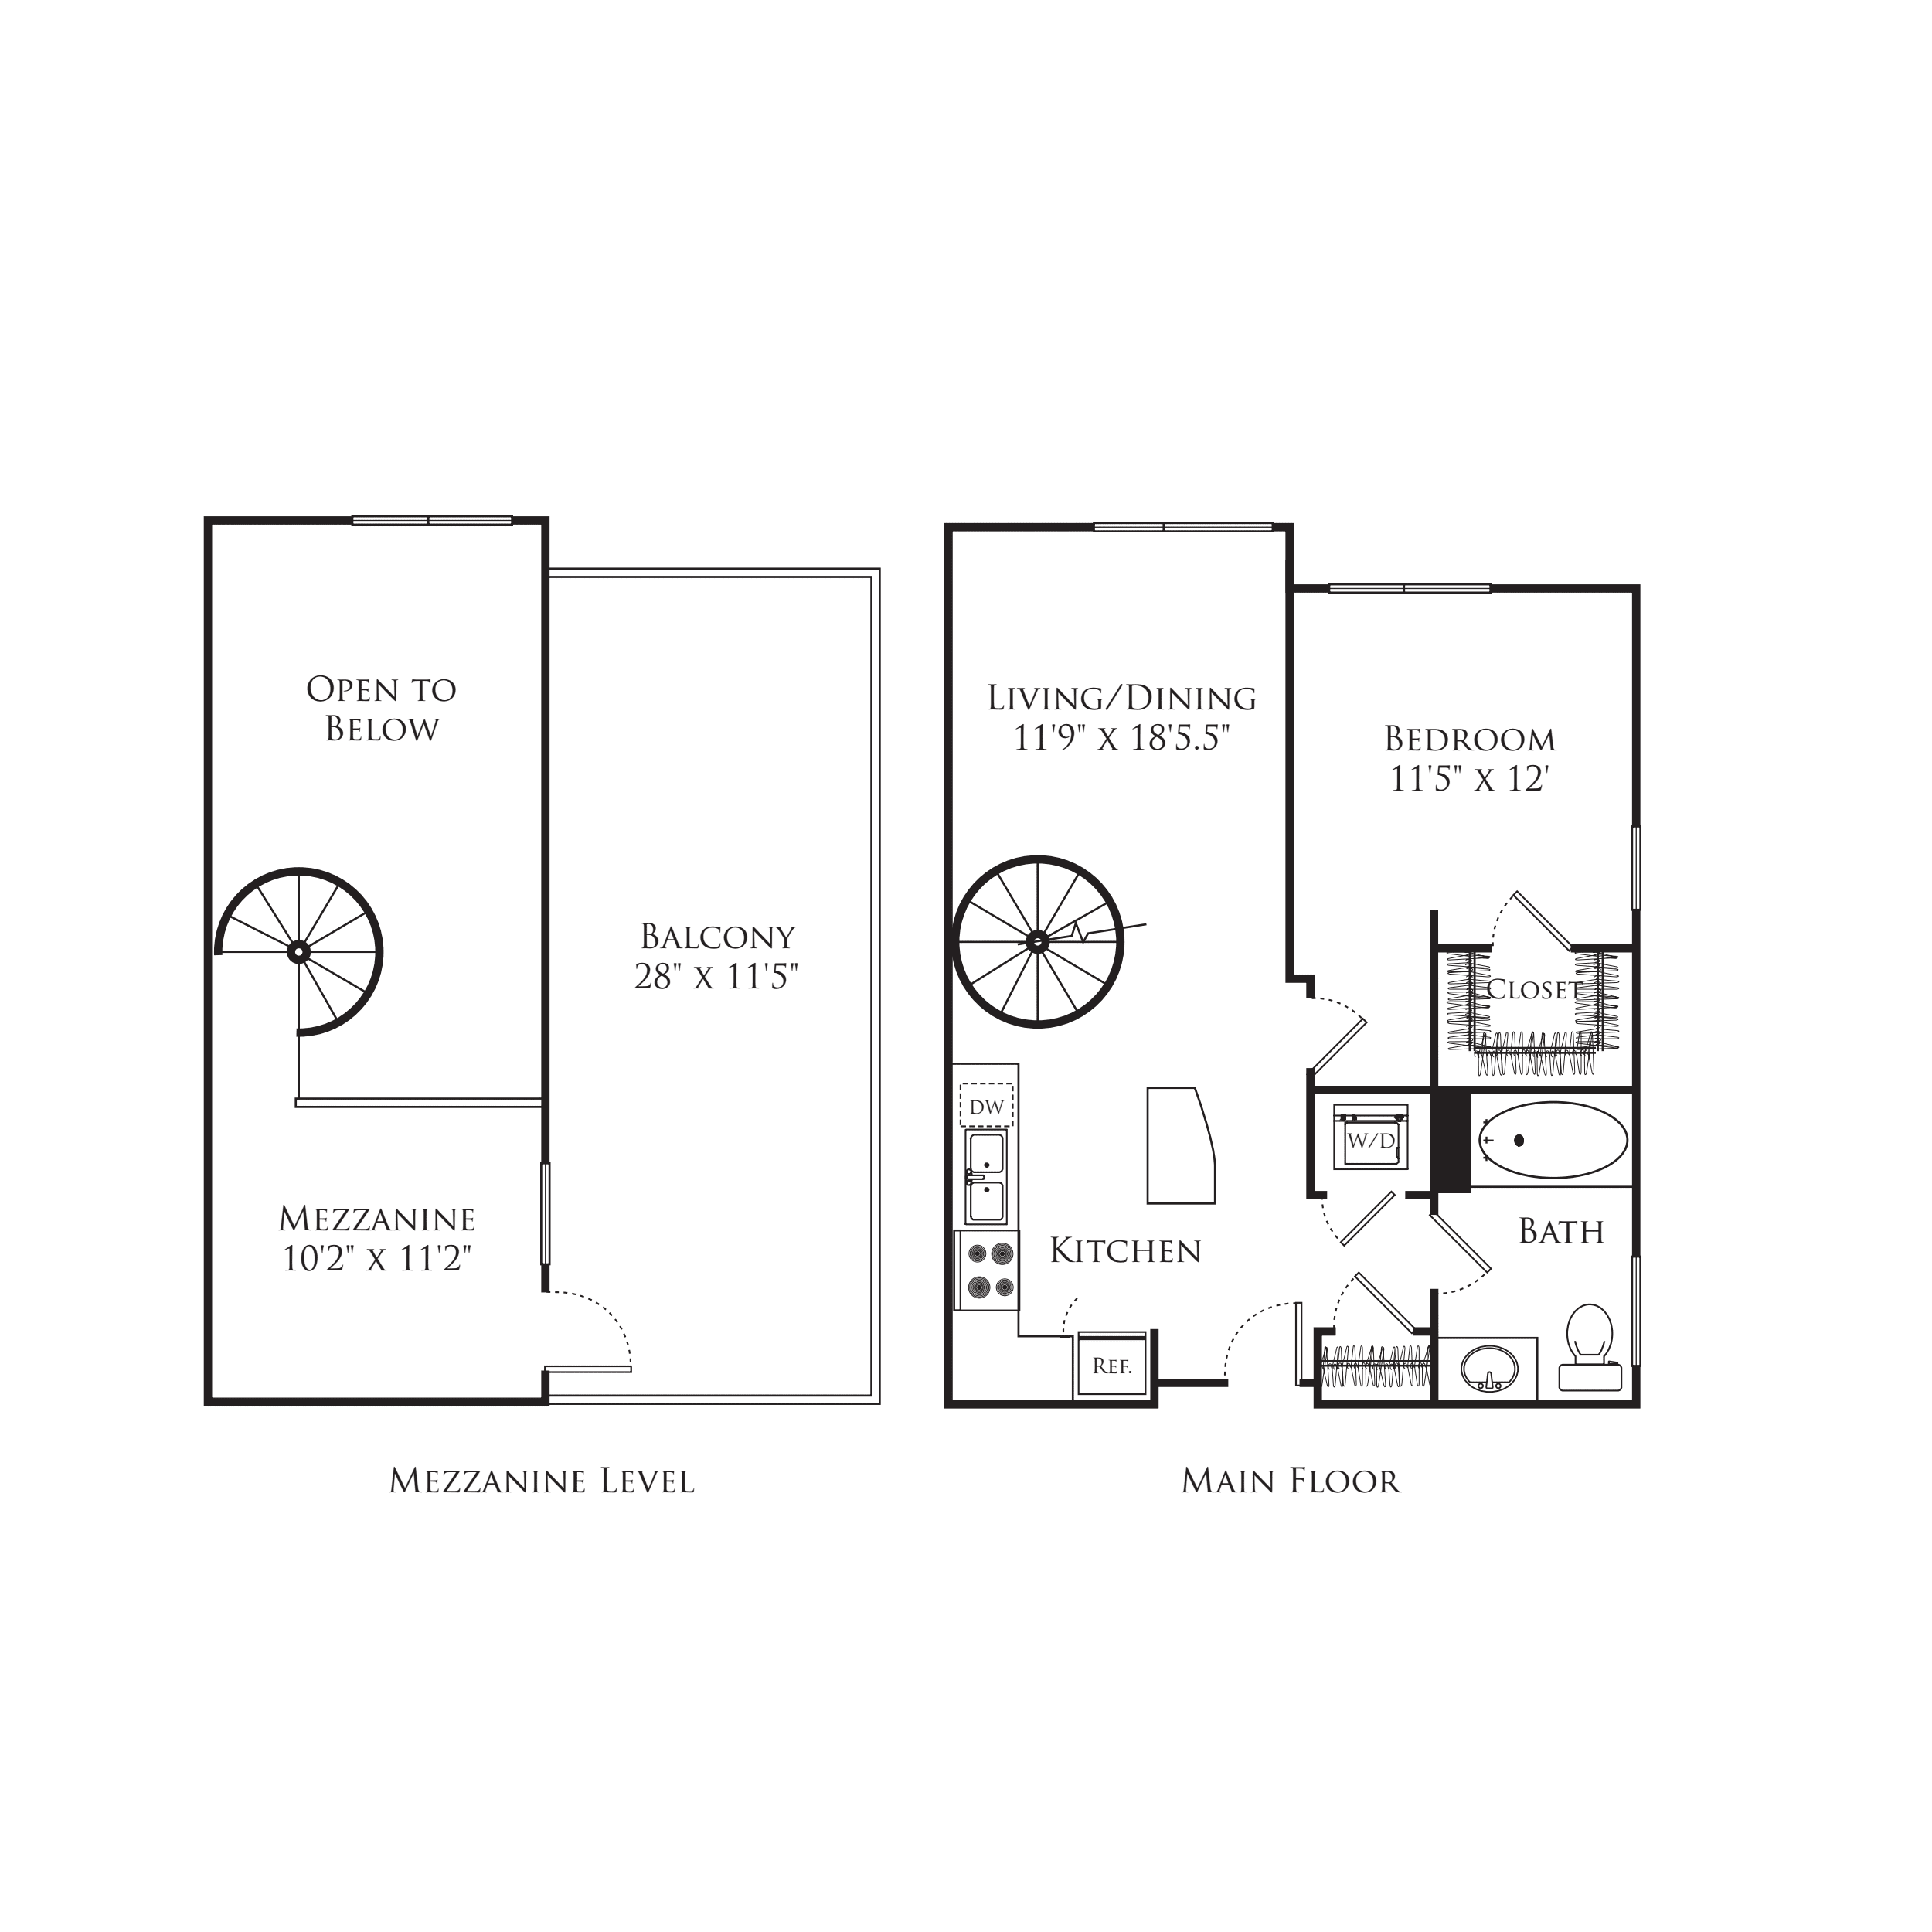 1 Bedroom MC